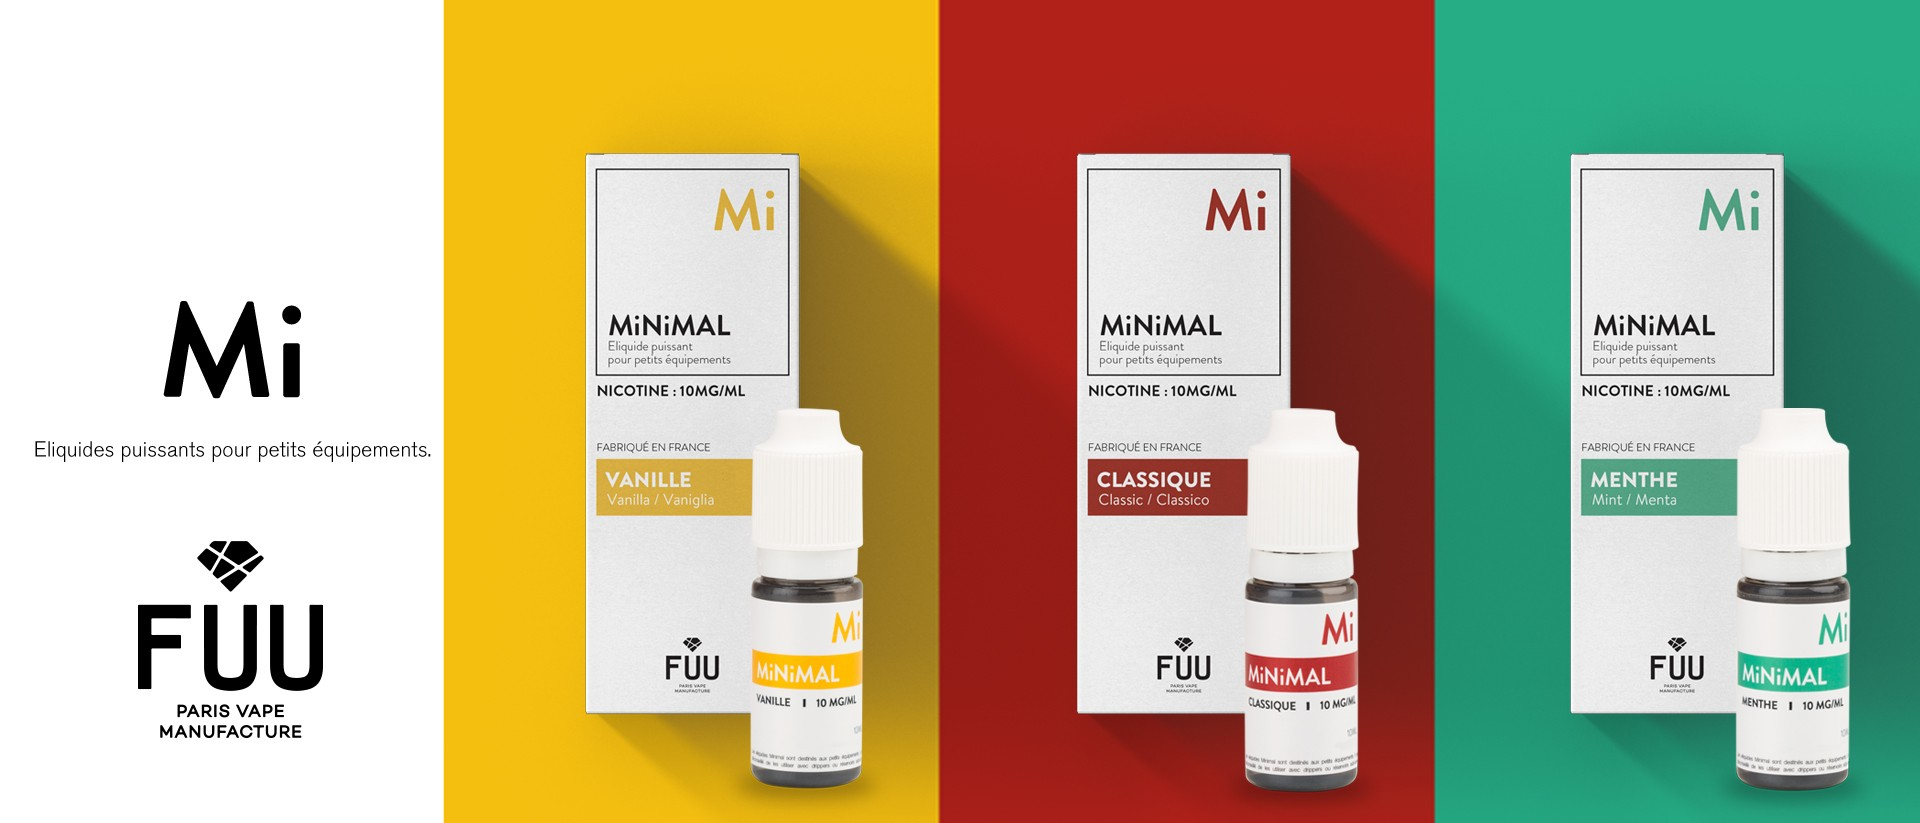 The Fuu minimal (sel de nicotine)